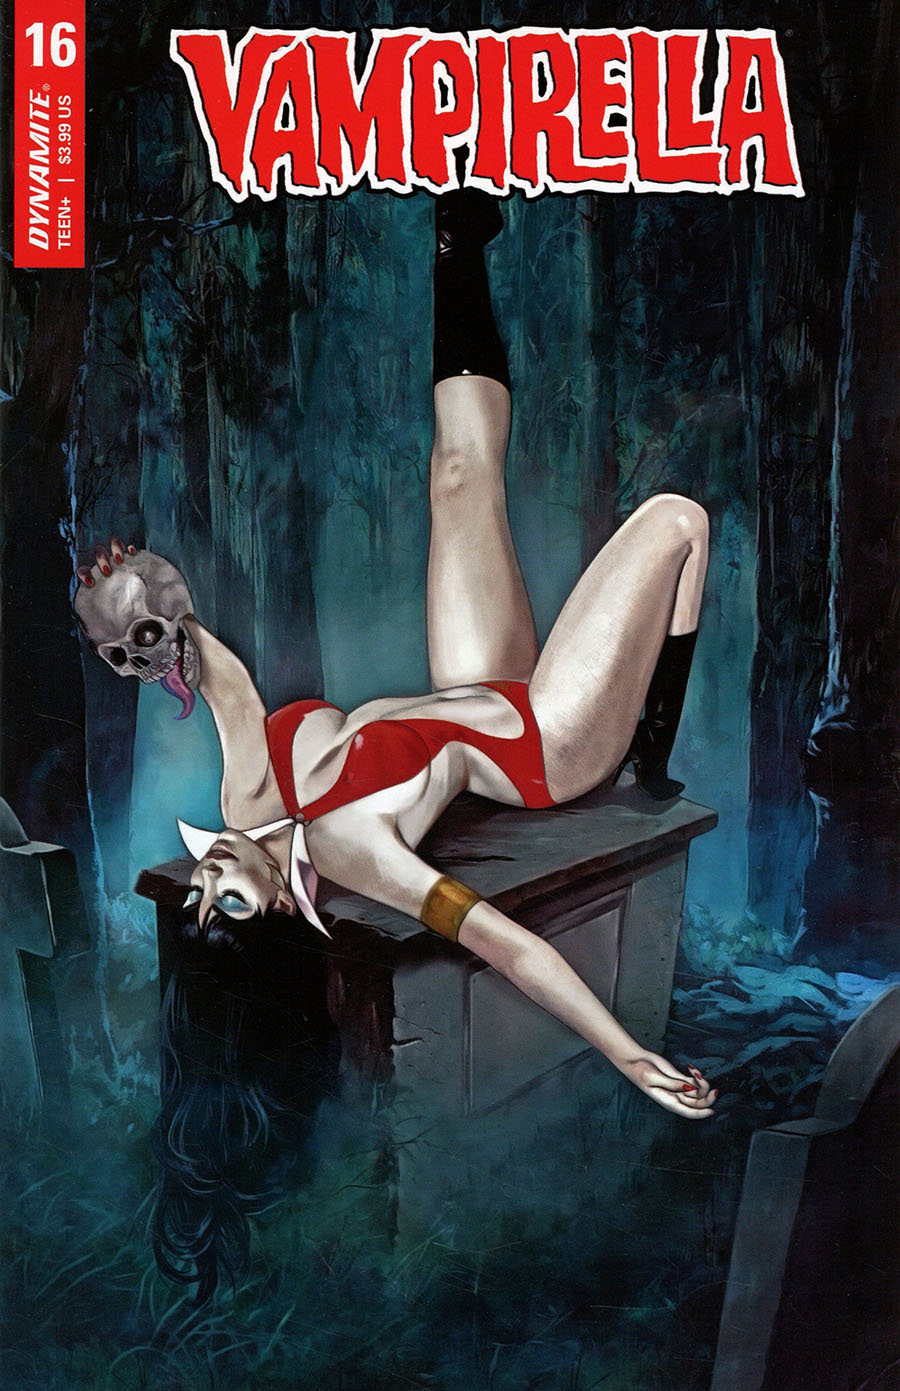 Vampirella Vol 8 #16 Cover C Variant Fay Dalton Cover